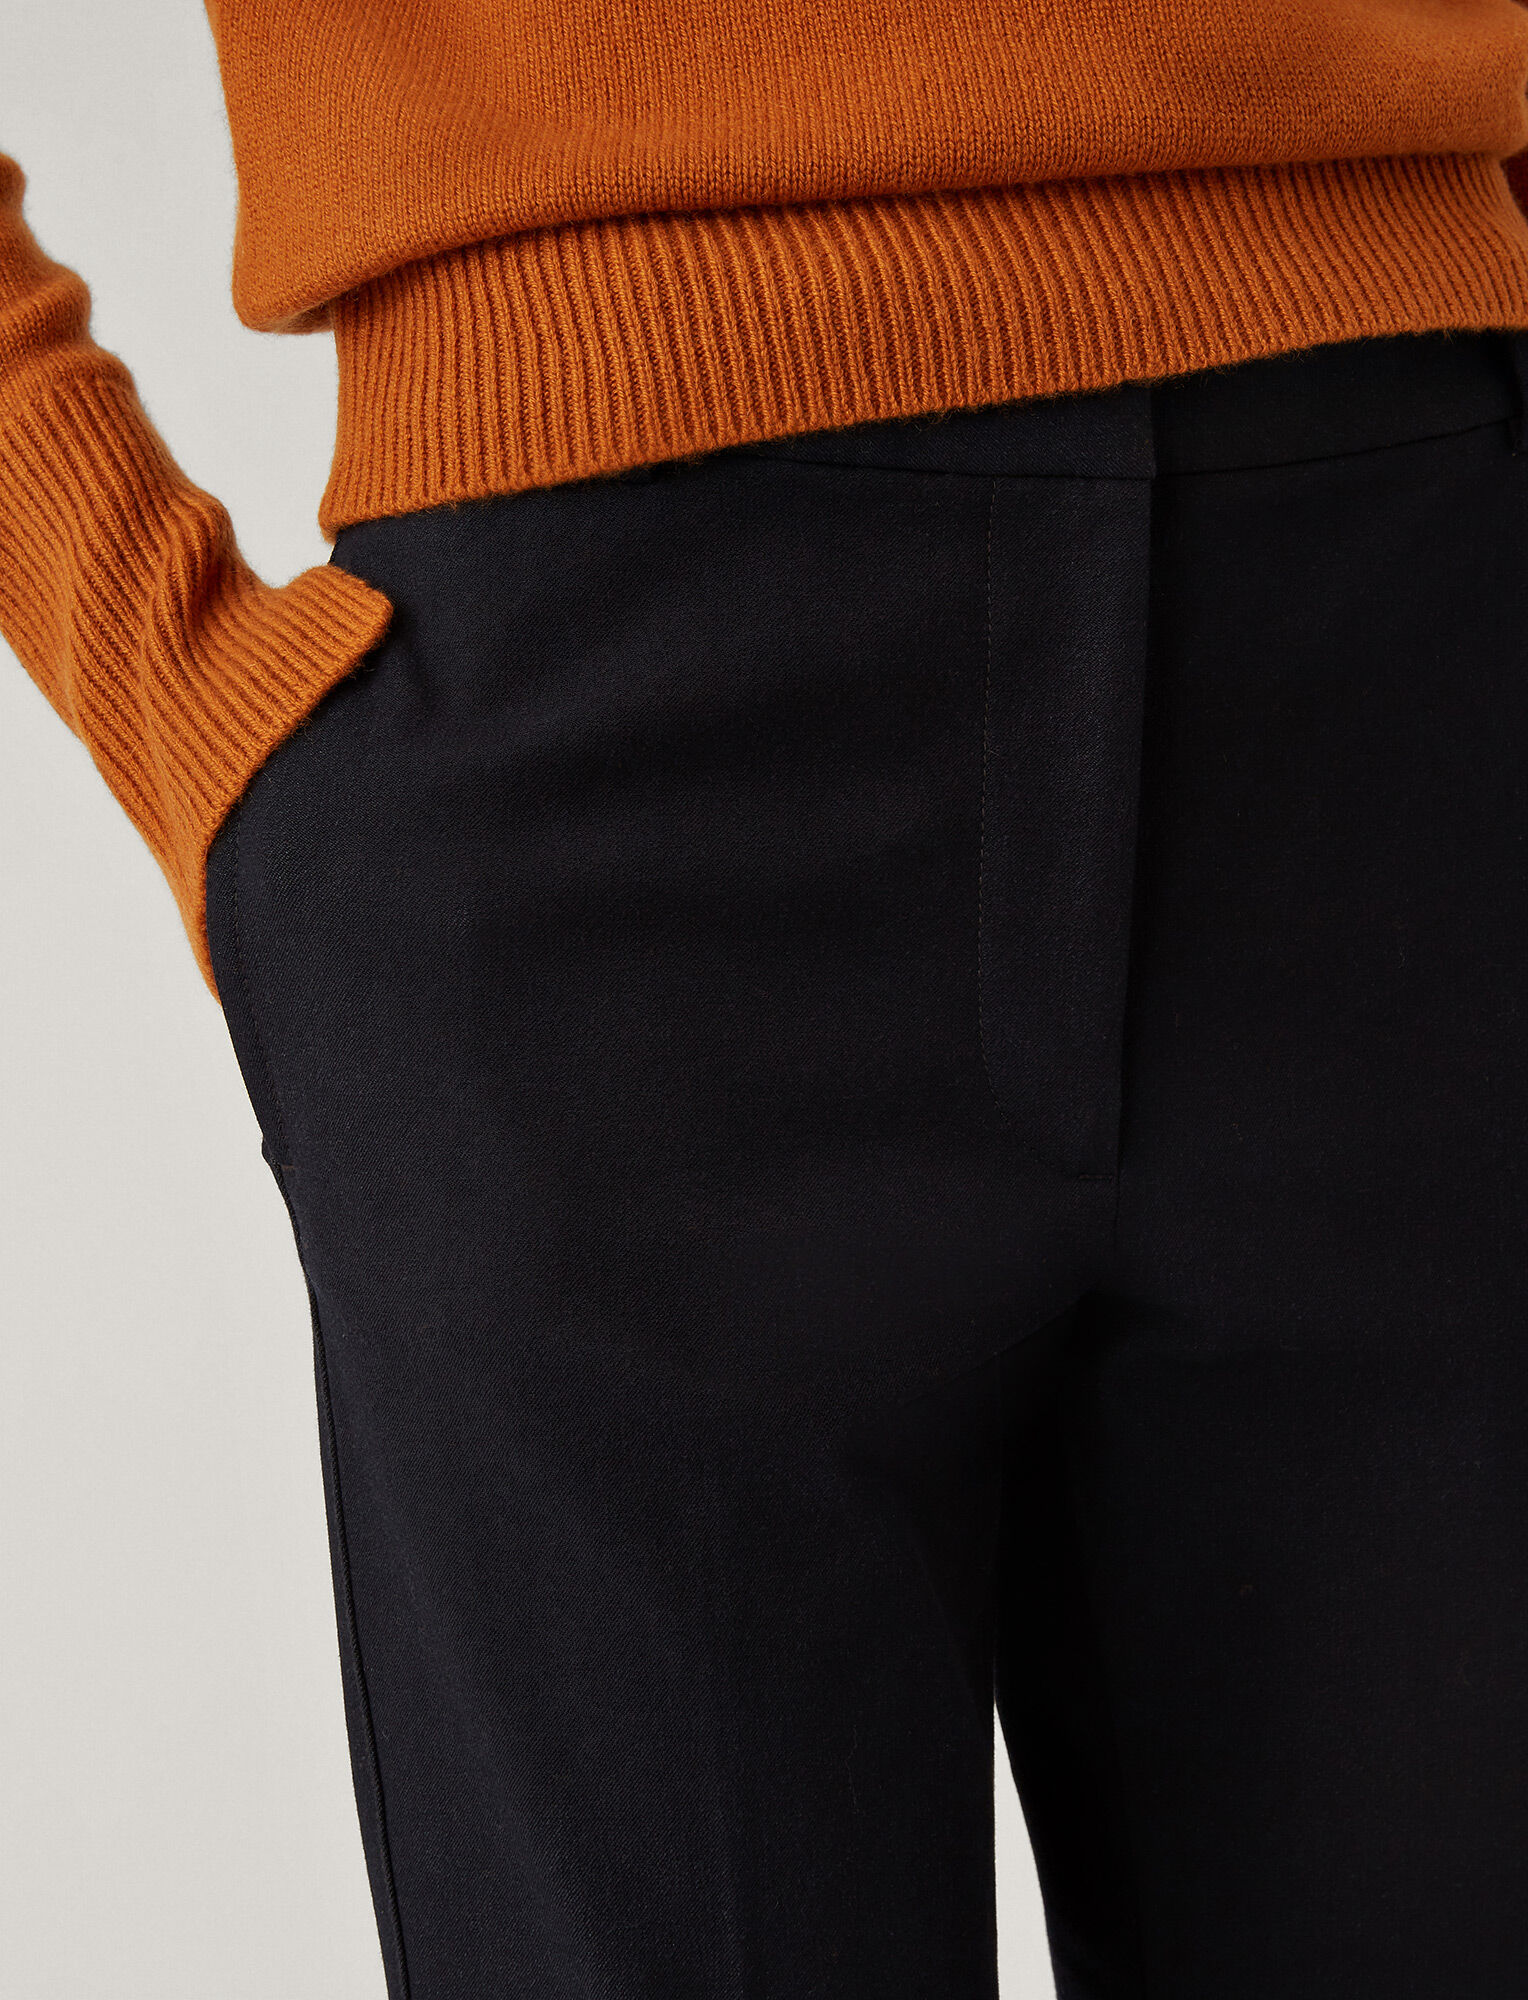 Joseph, Zoom Gabardine Stretch Trousers, in NAVY